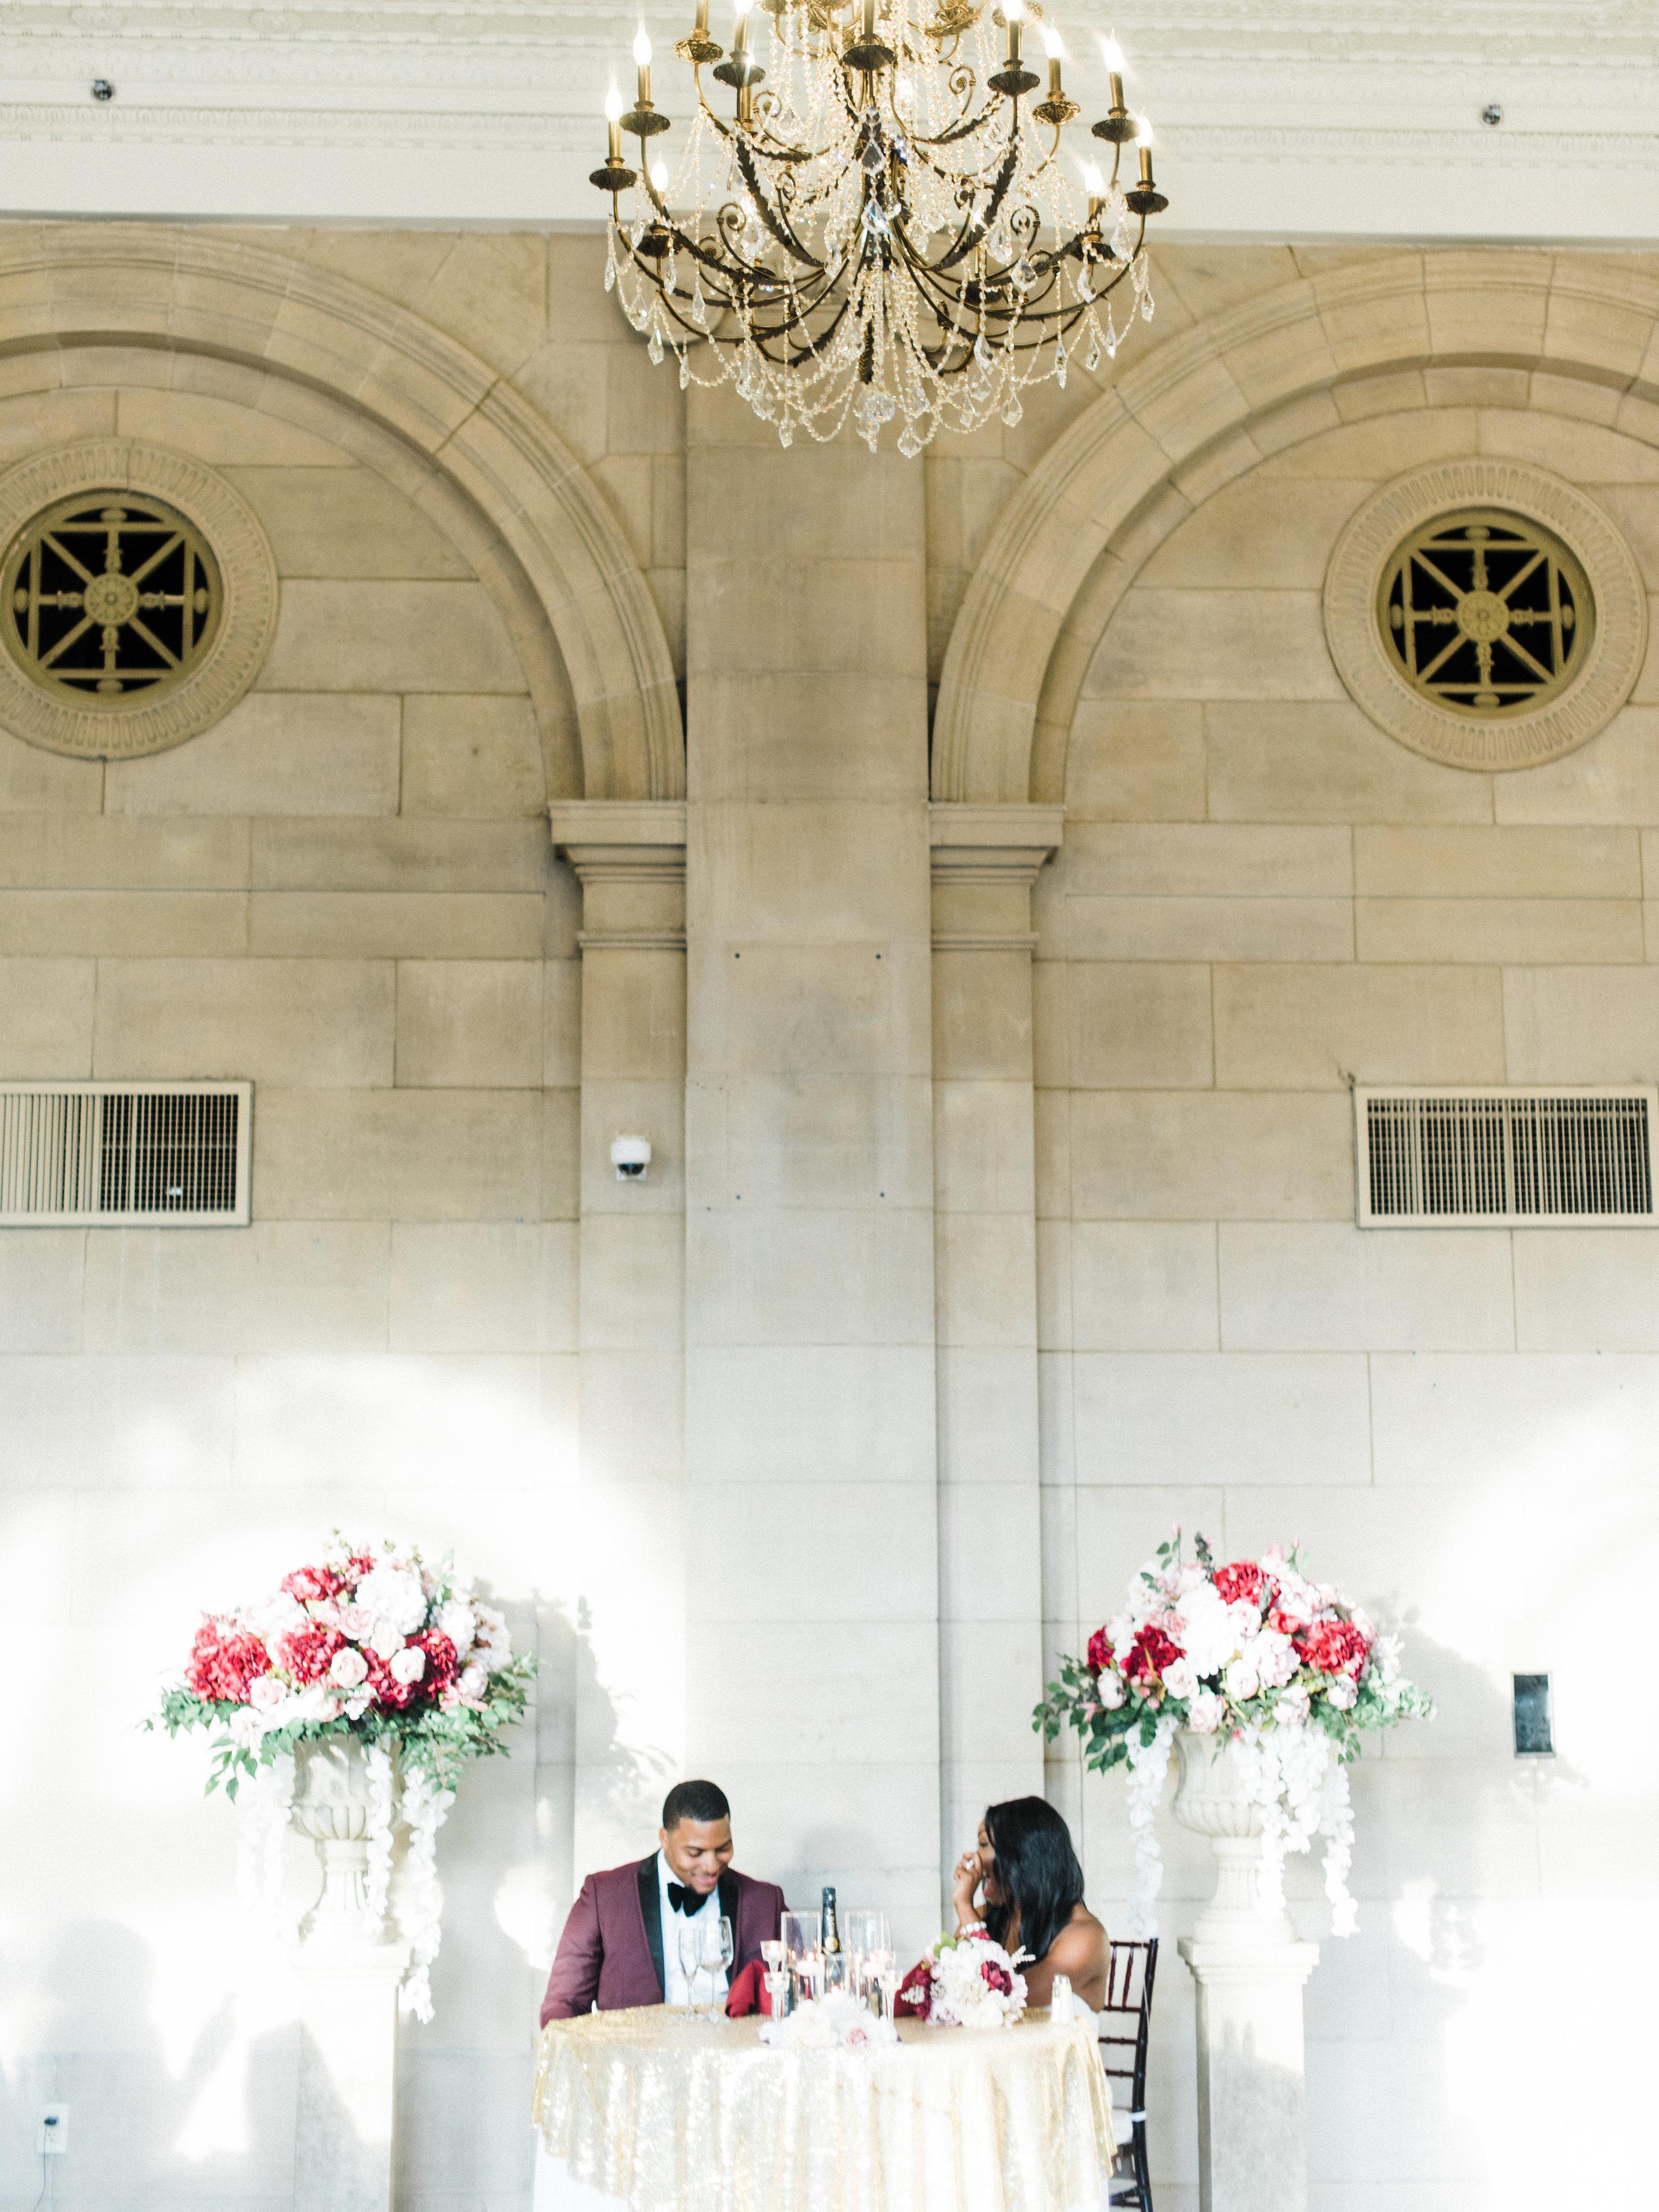 shanice & stephen wedding reception